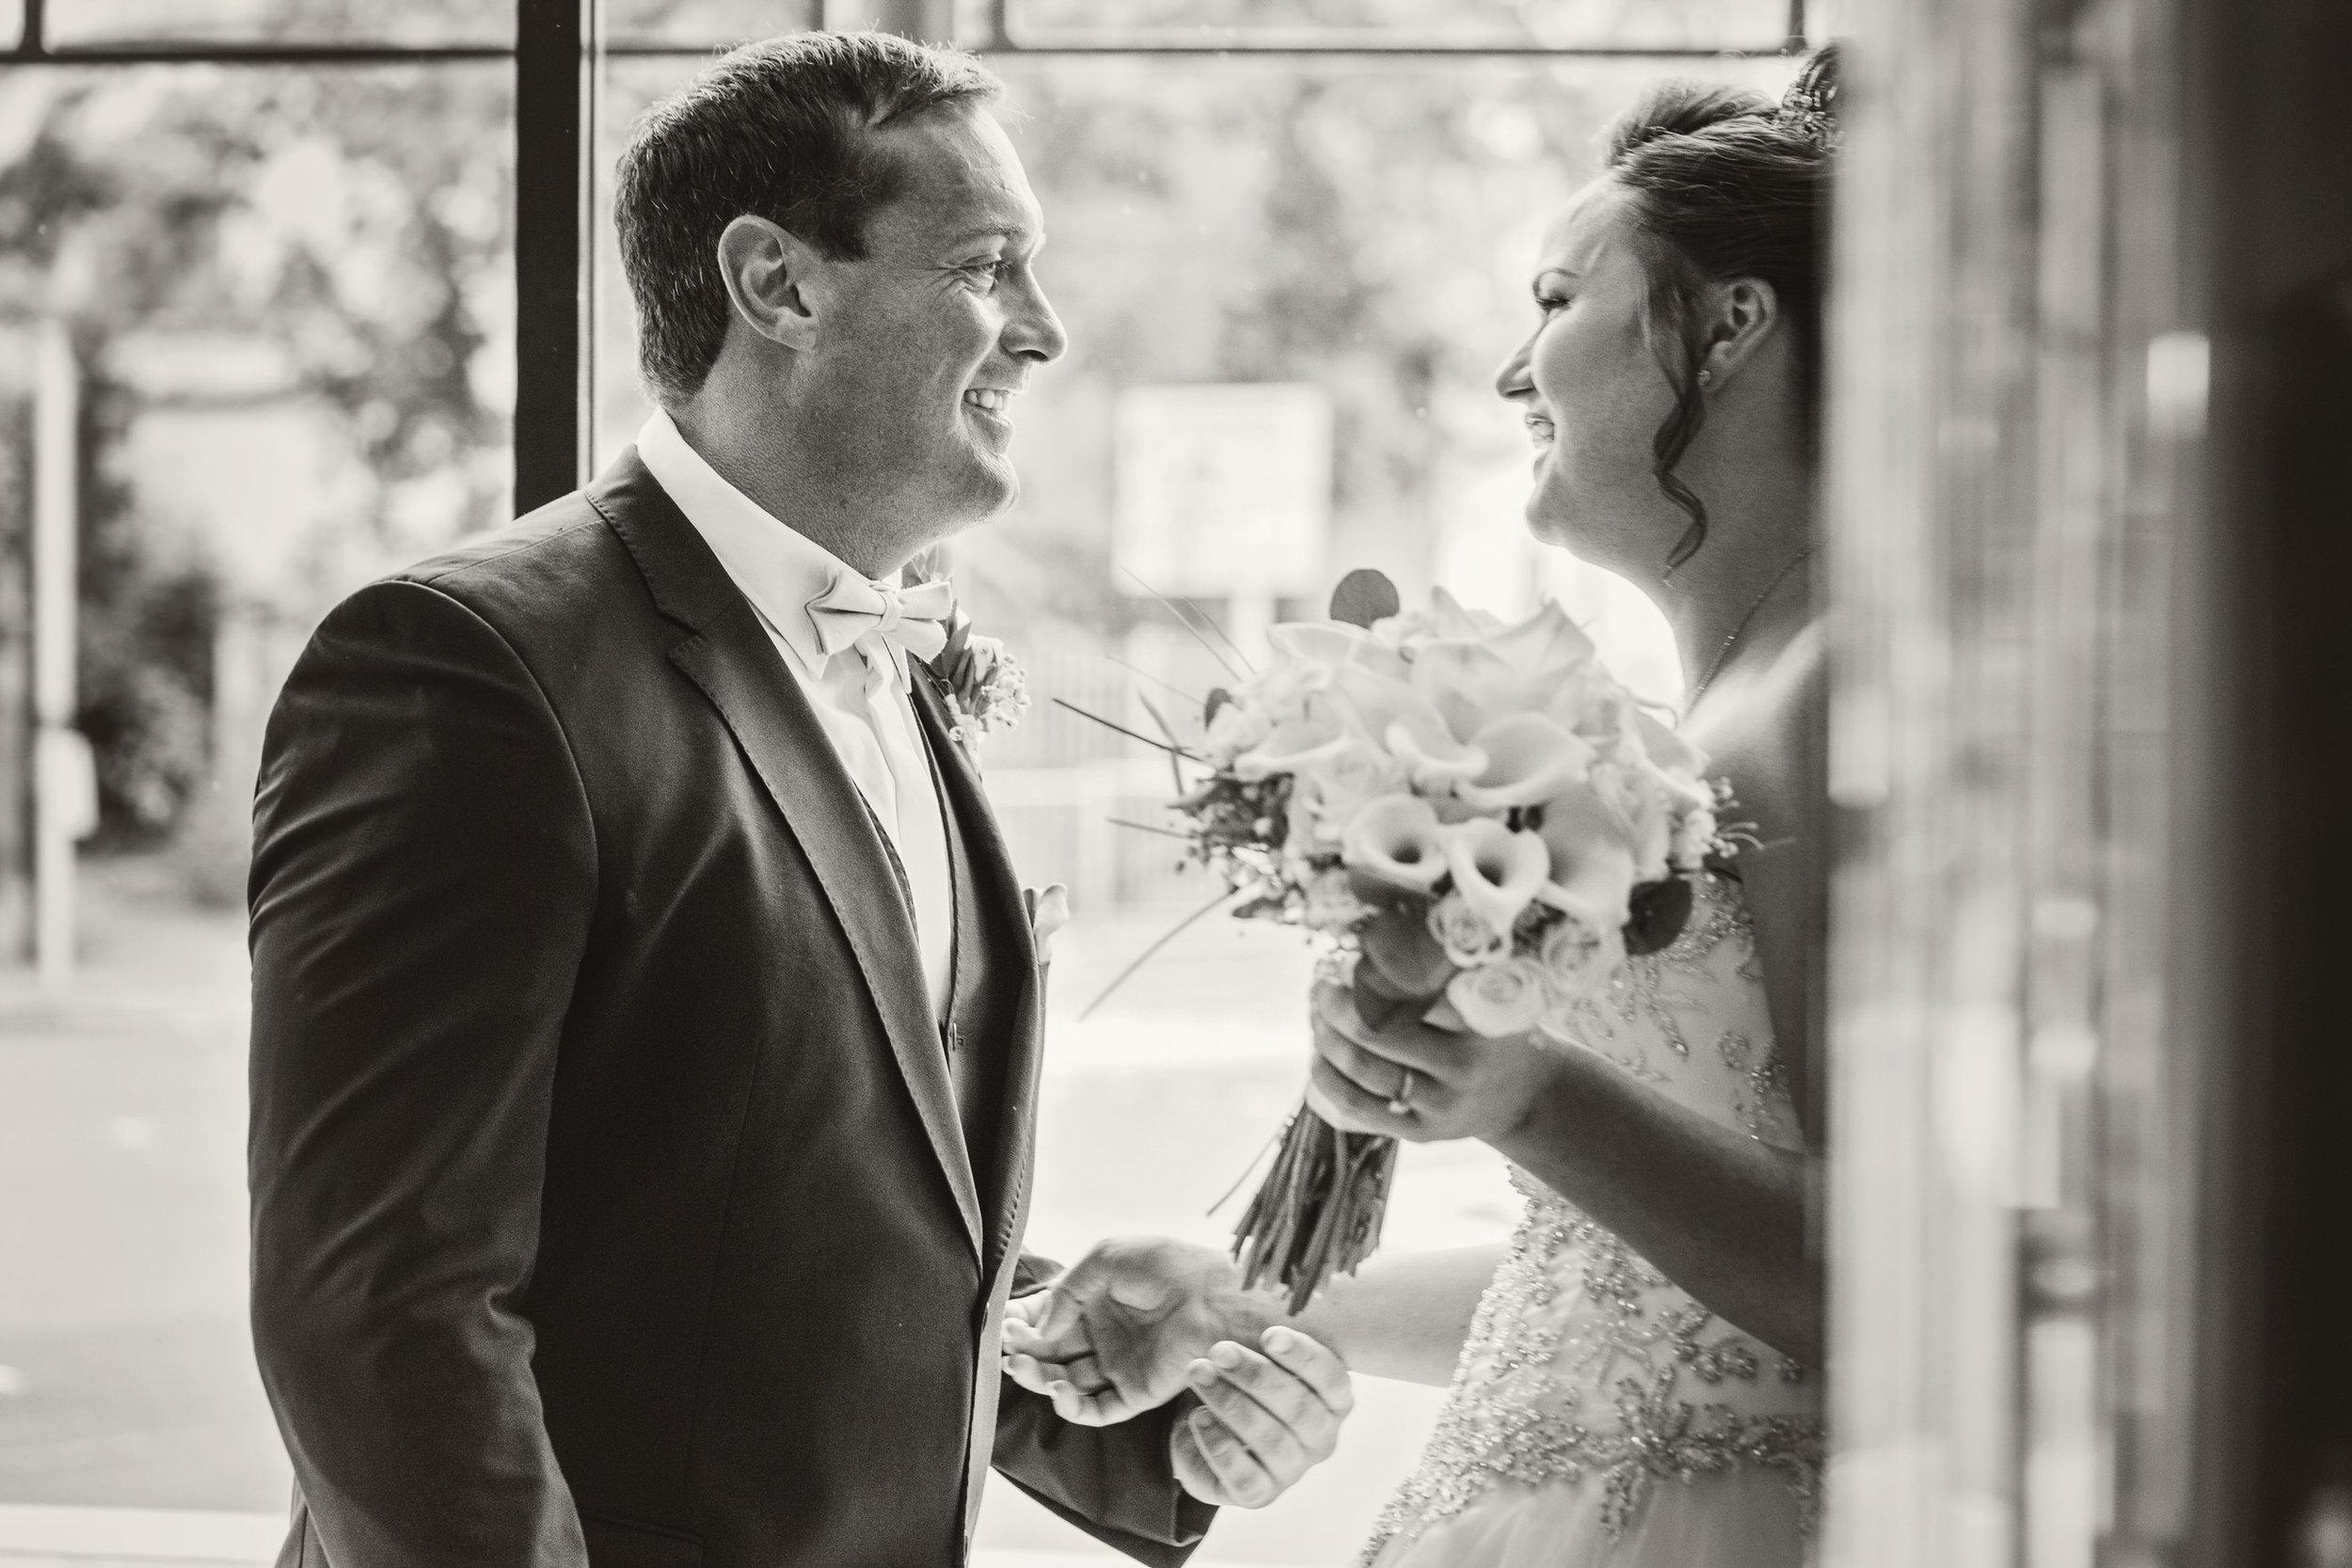 Philip-Danielle-Wedding0095.jpg